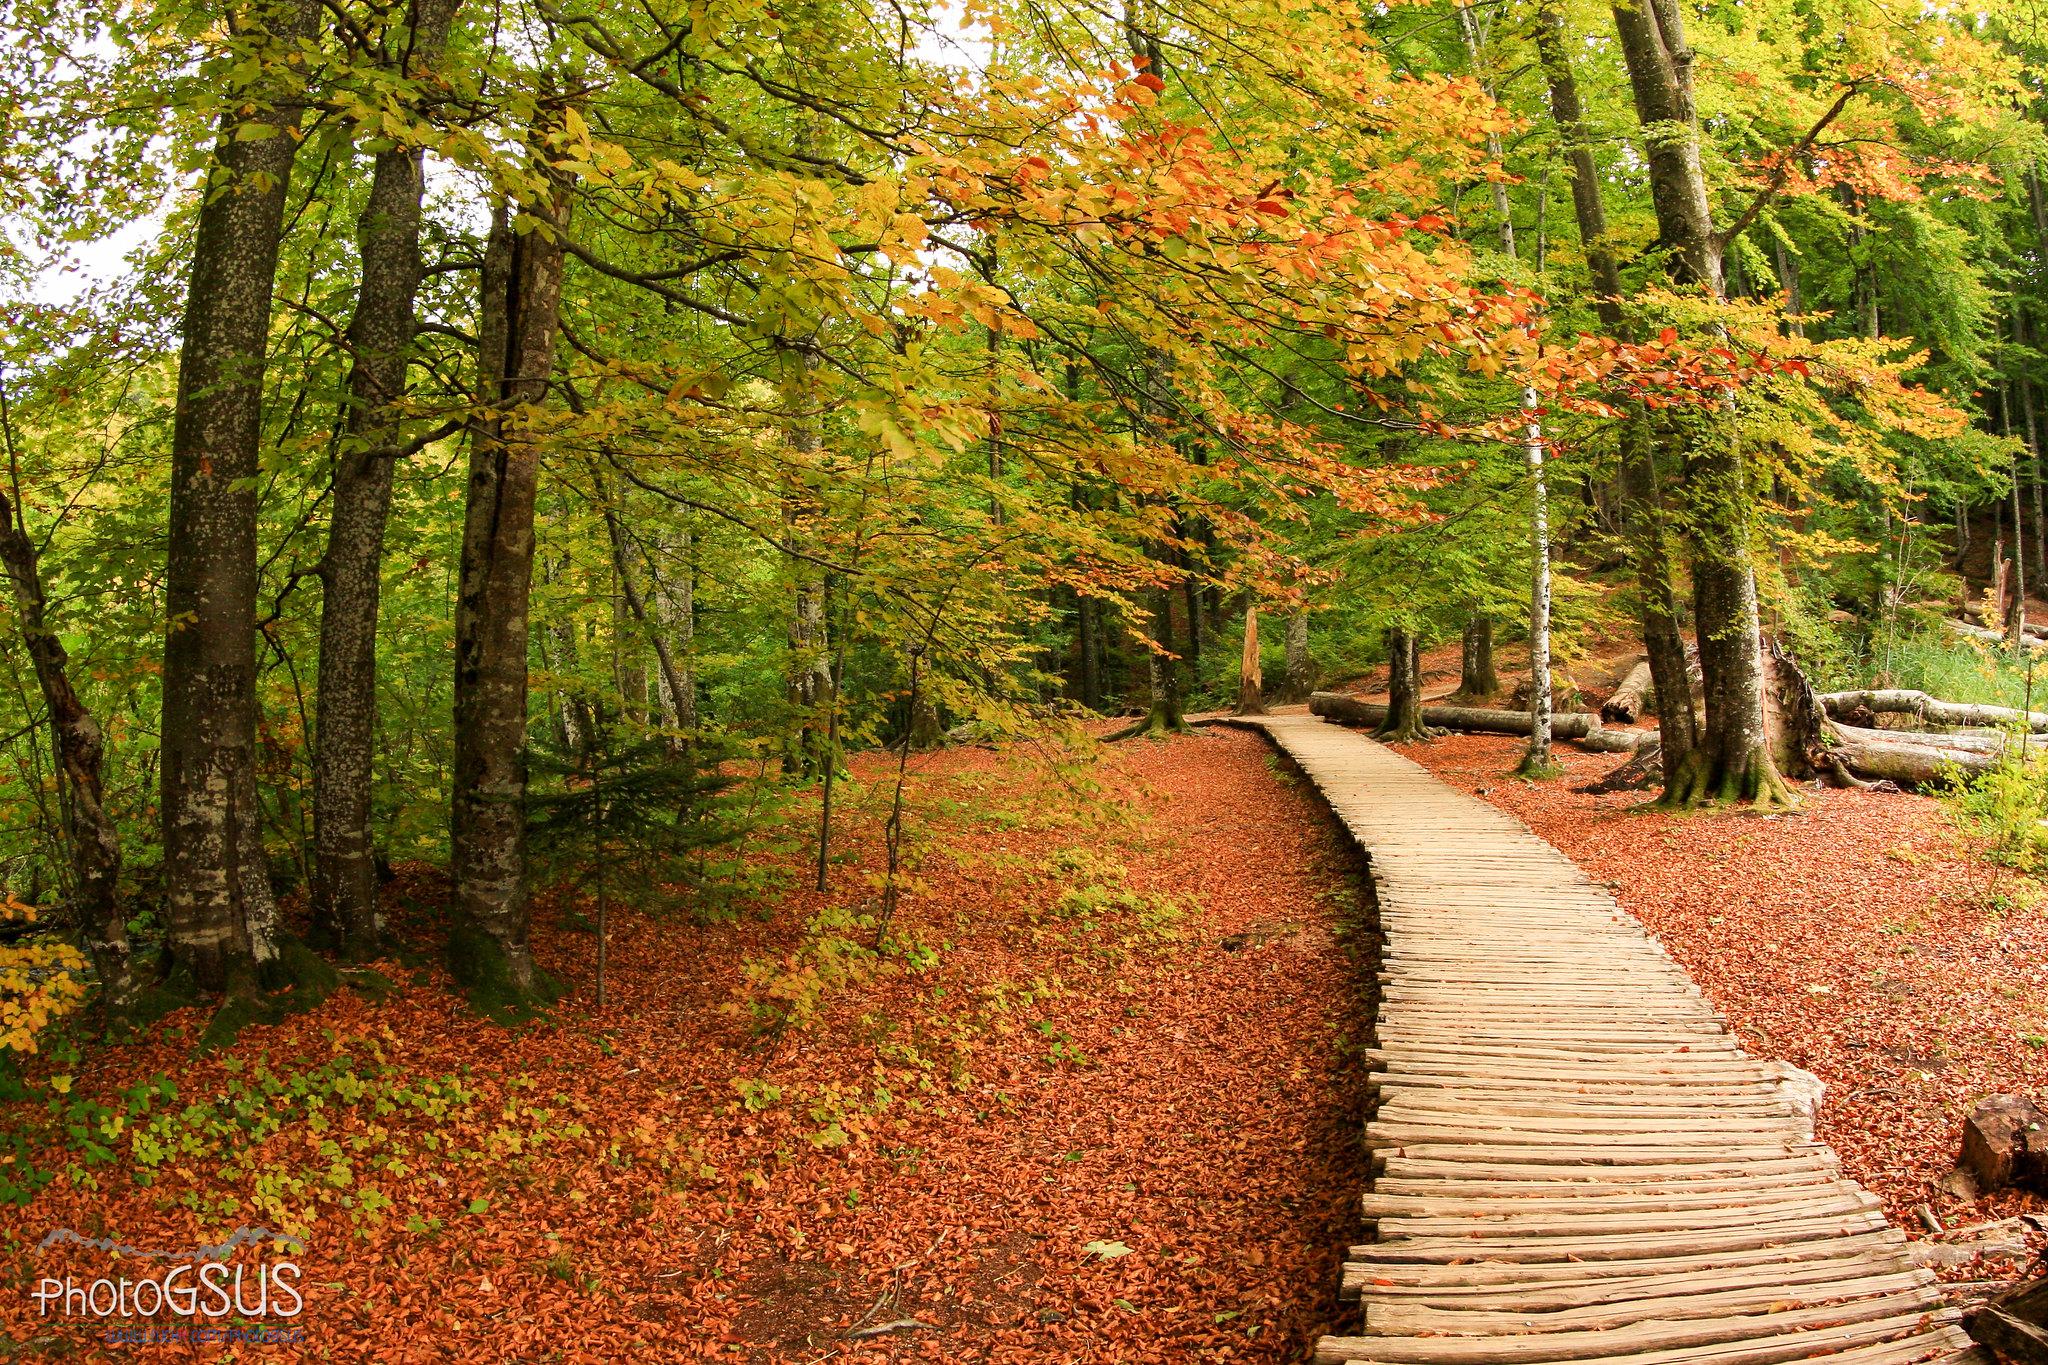 Autumn in Plitvice Lakes National Park - Croatia